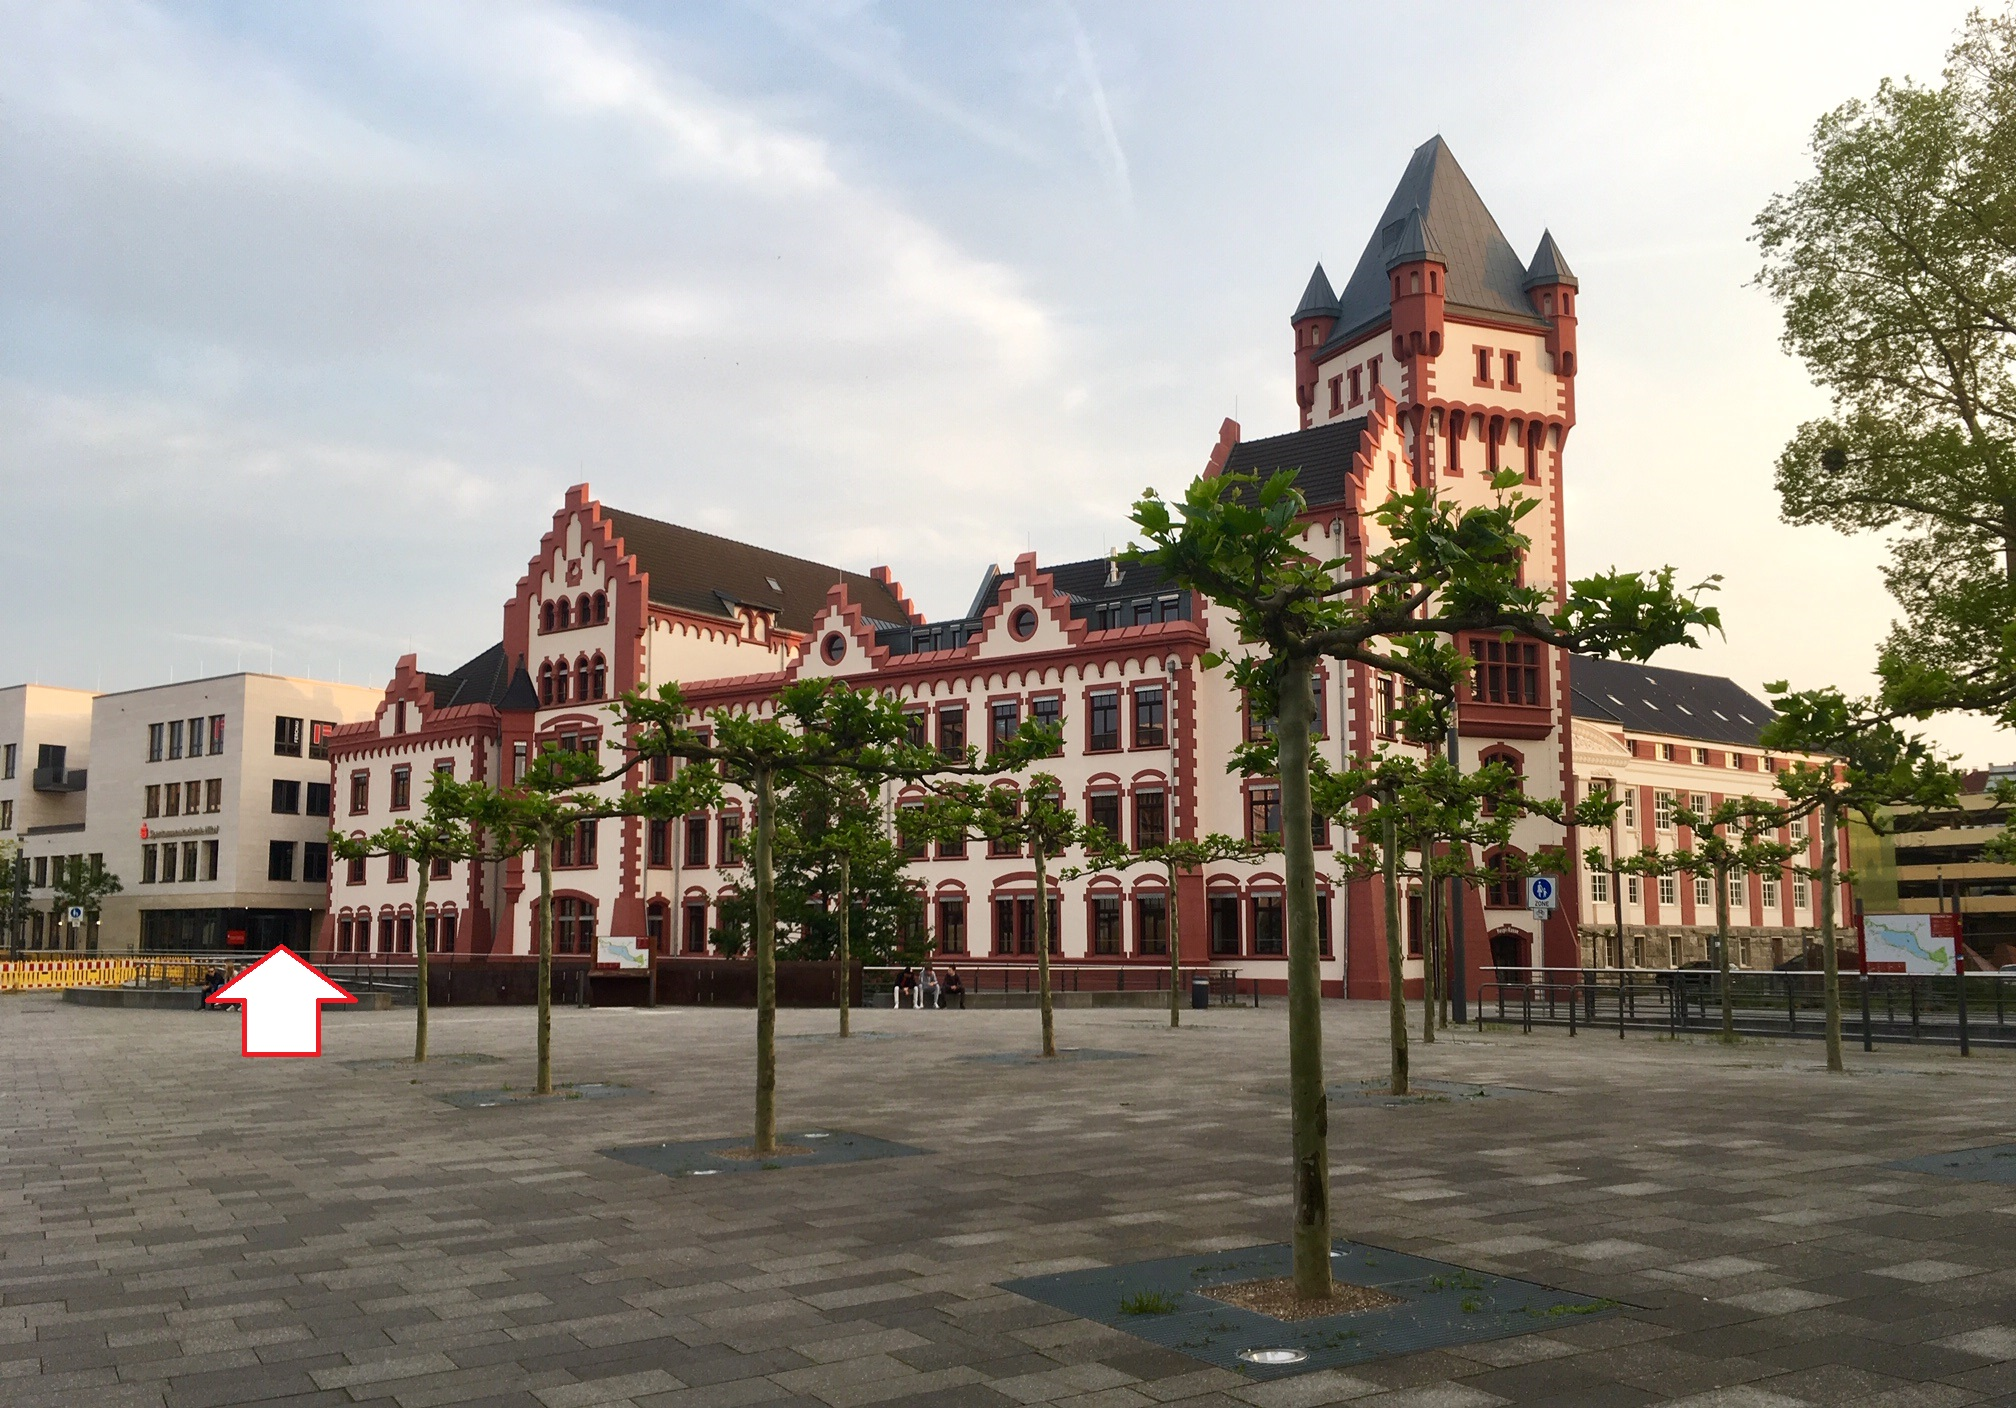 Sparkassenakademie in Dortmund